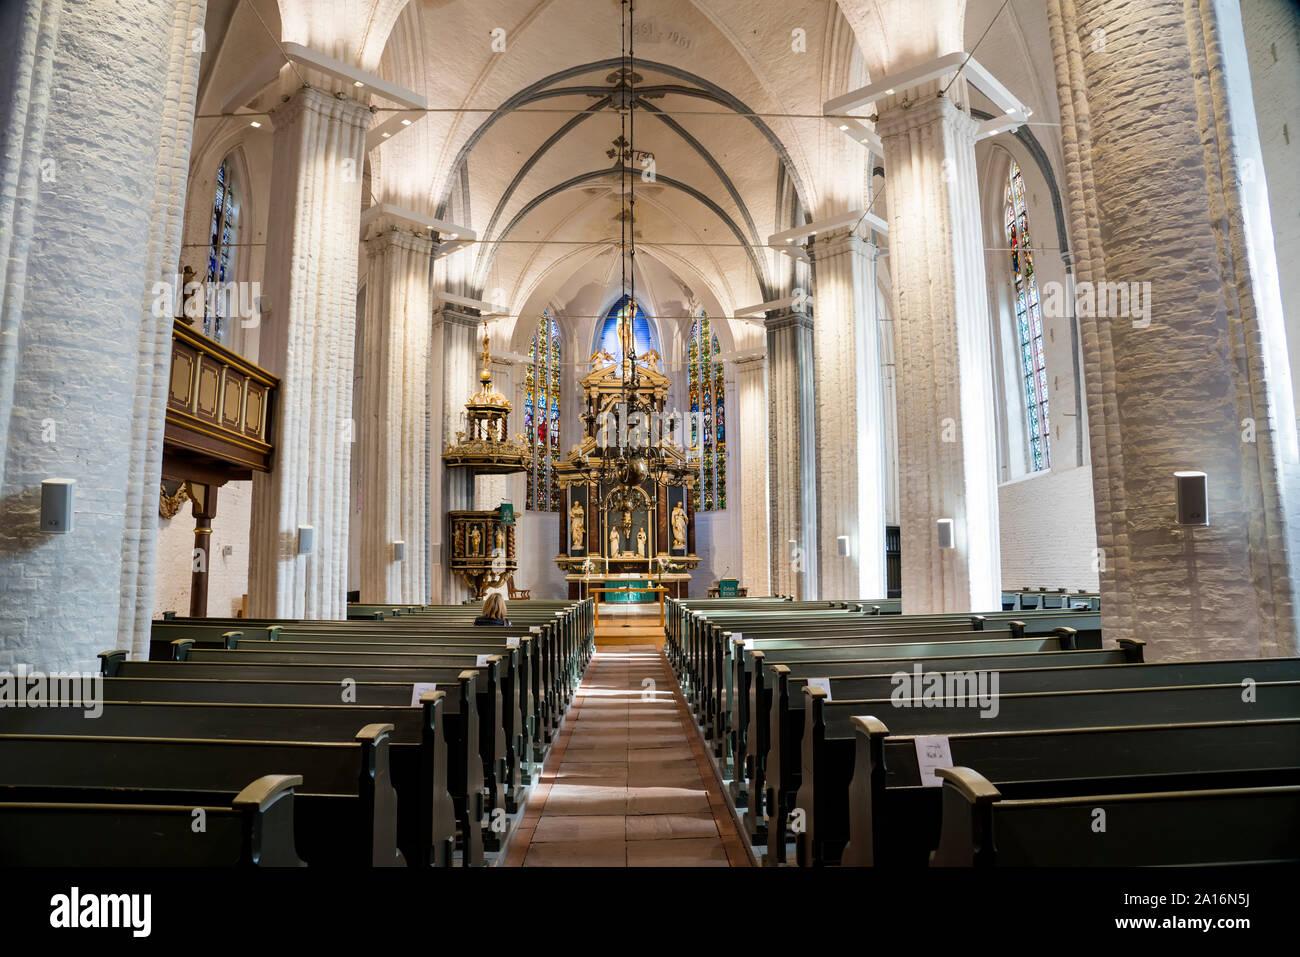 Vista interna, St Wilhadi-Church, Stade, Bassa Sassonia, Germania, Europa Foto Stock